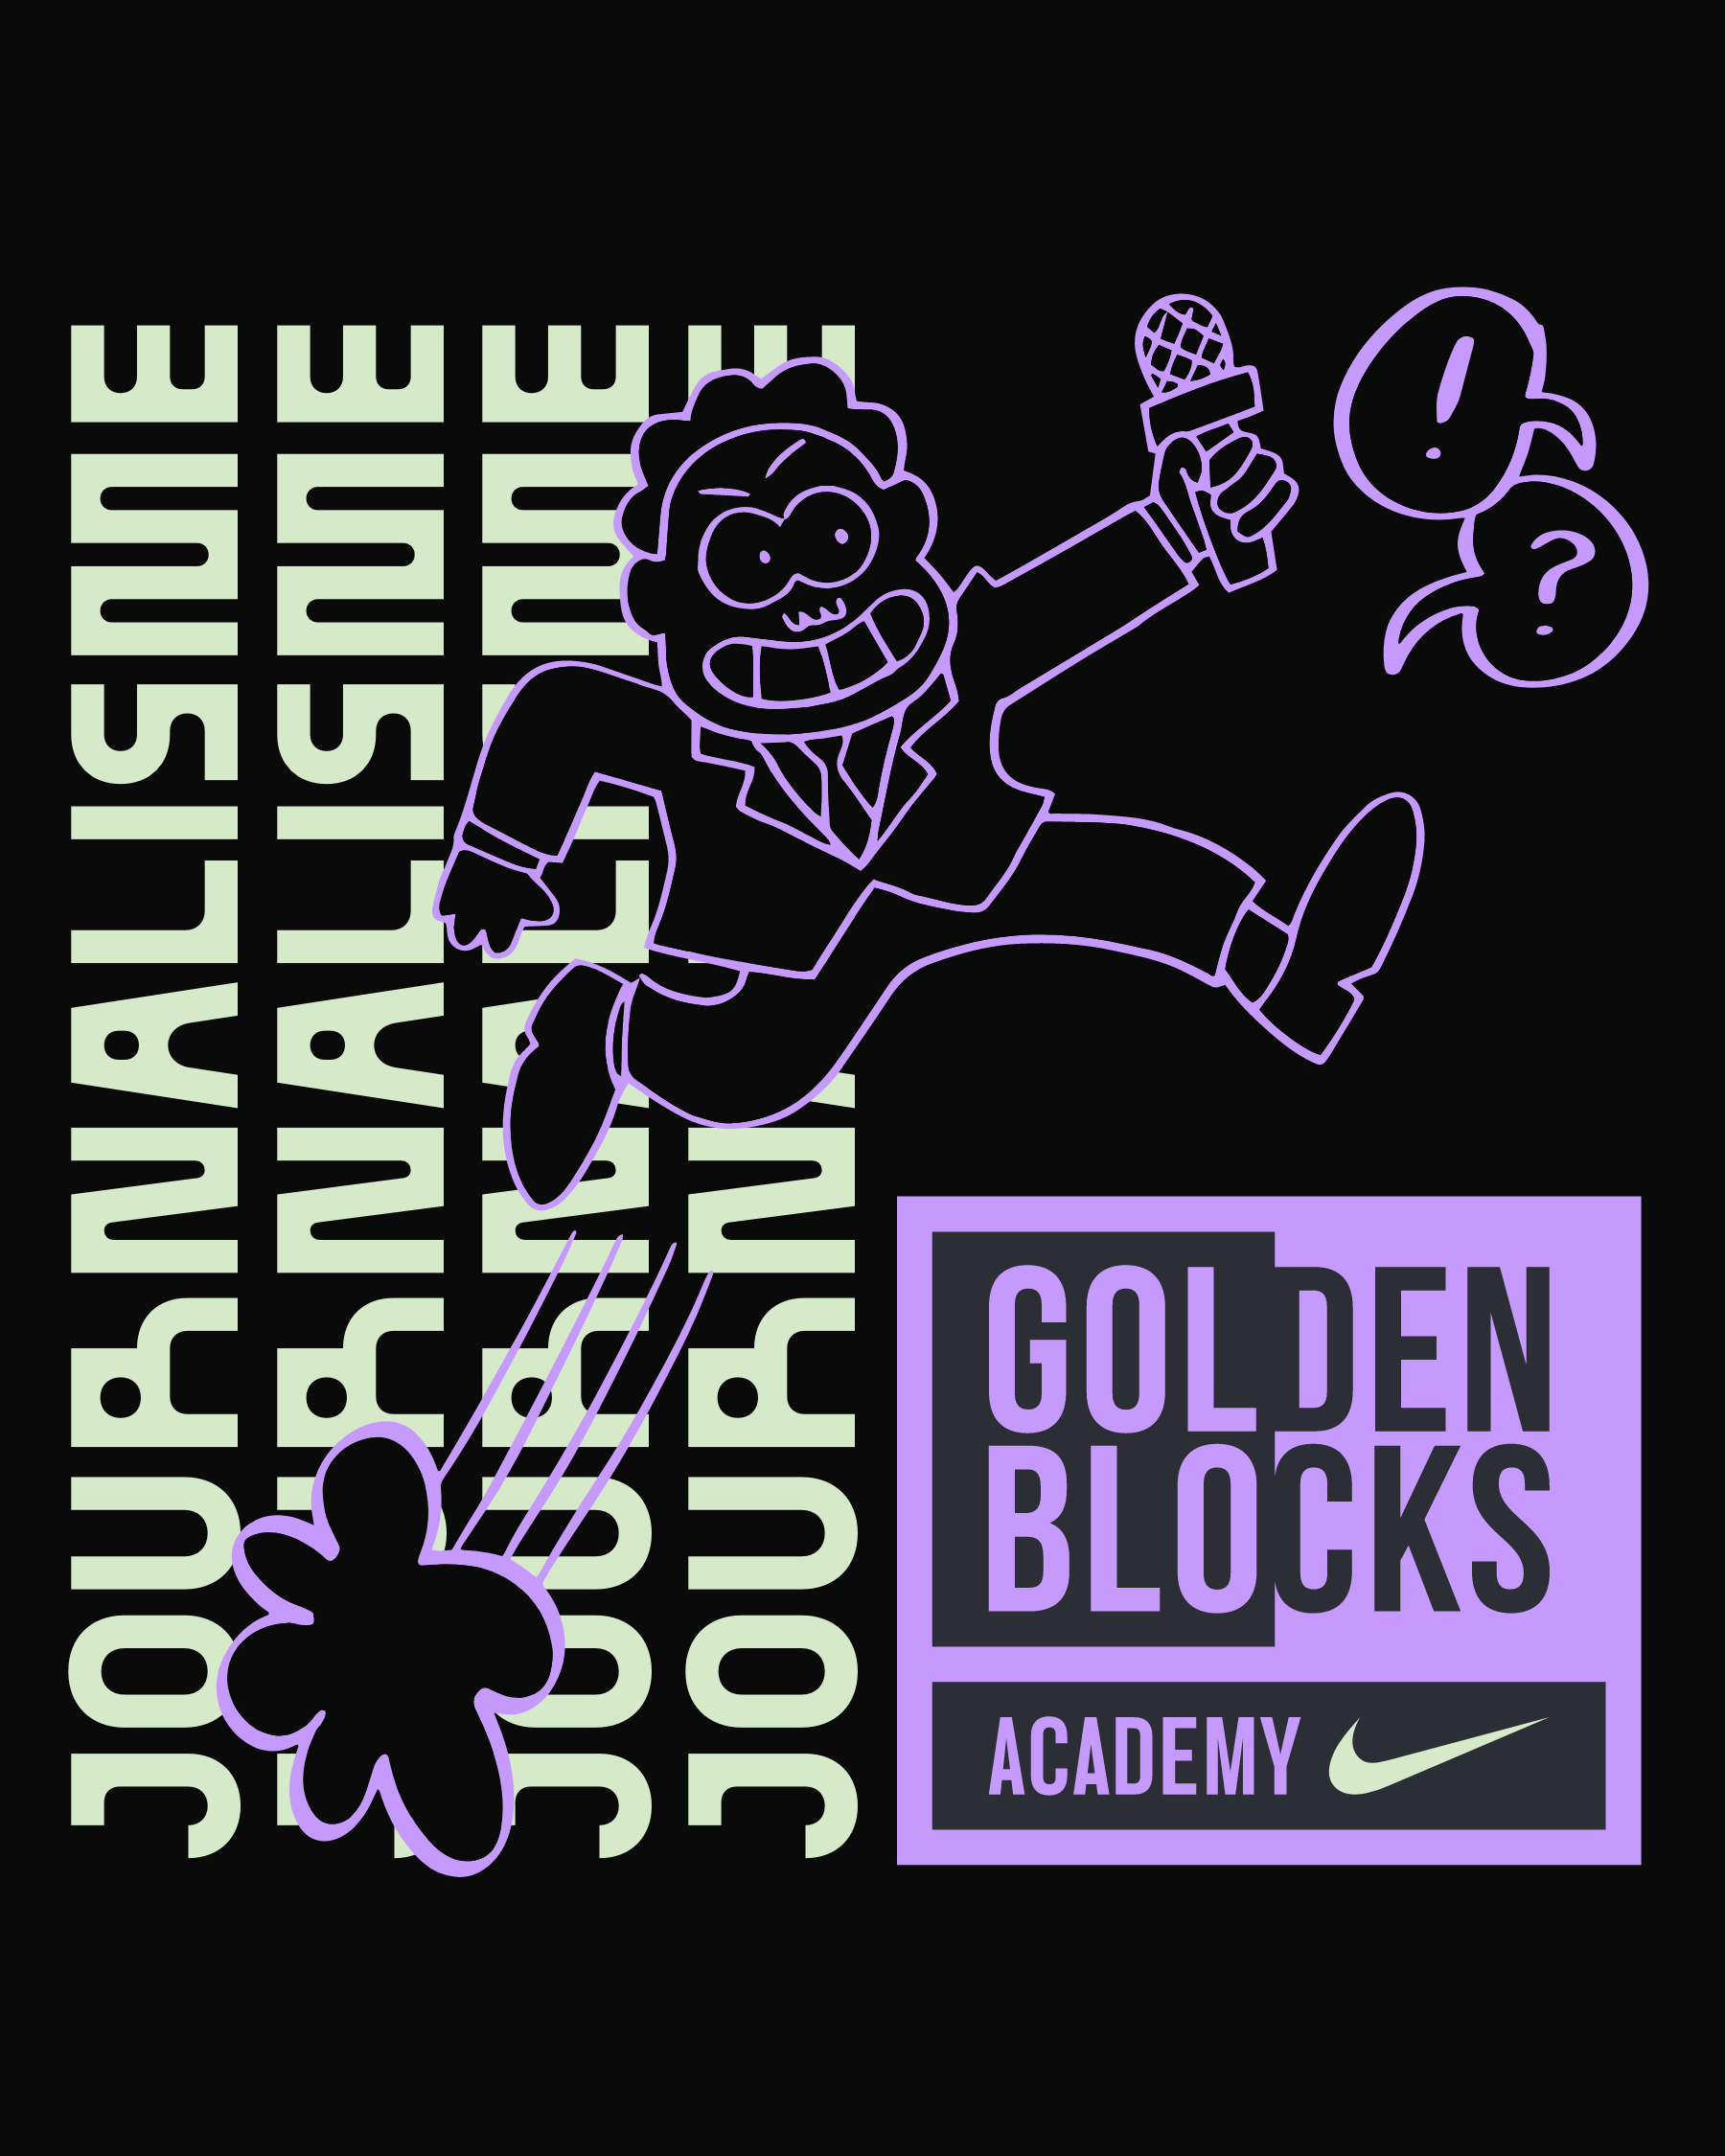 Image-site-web-run-design-web-golden-blocks-agence-conseil-en-communication-Letb-synergie